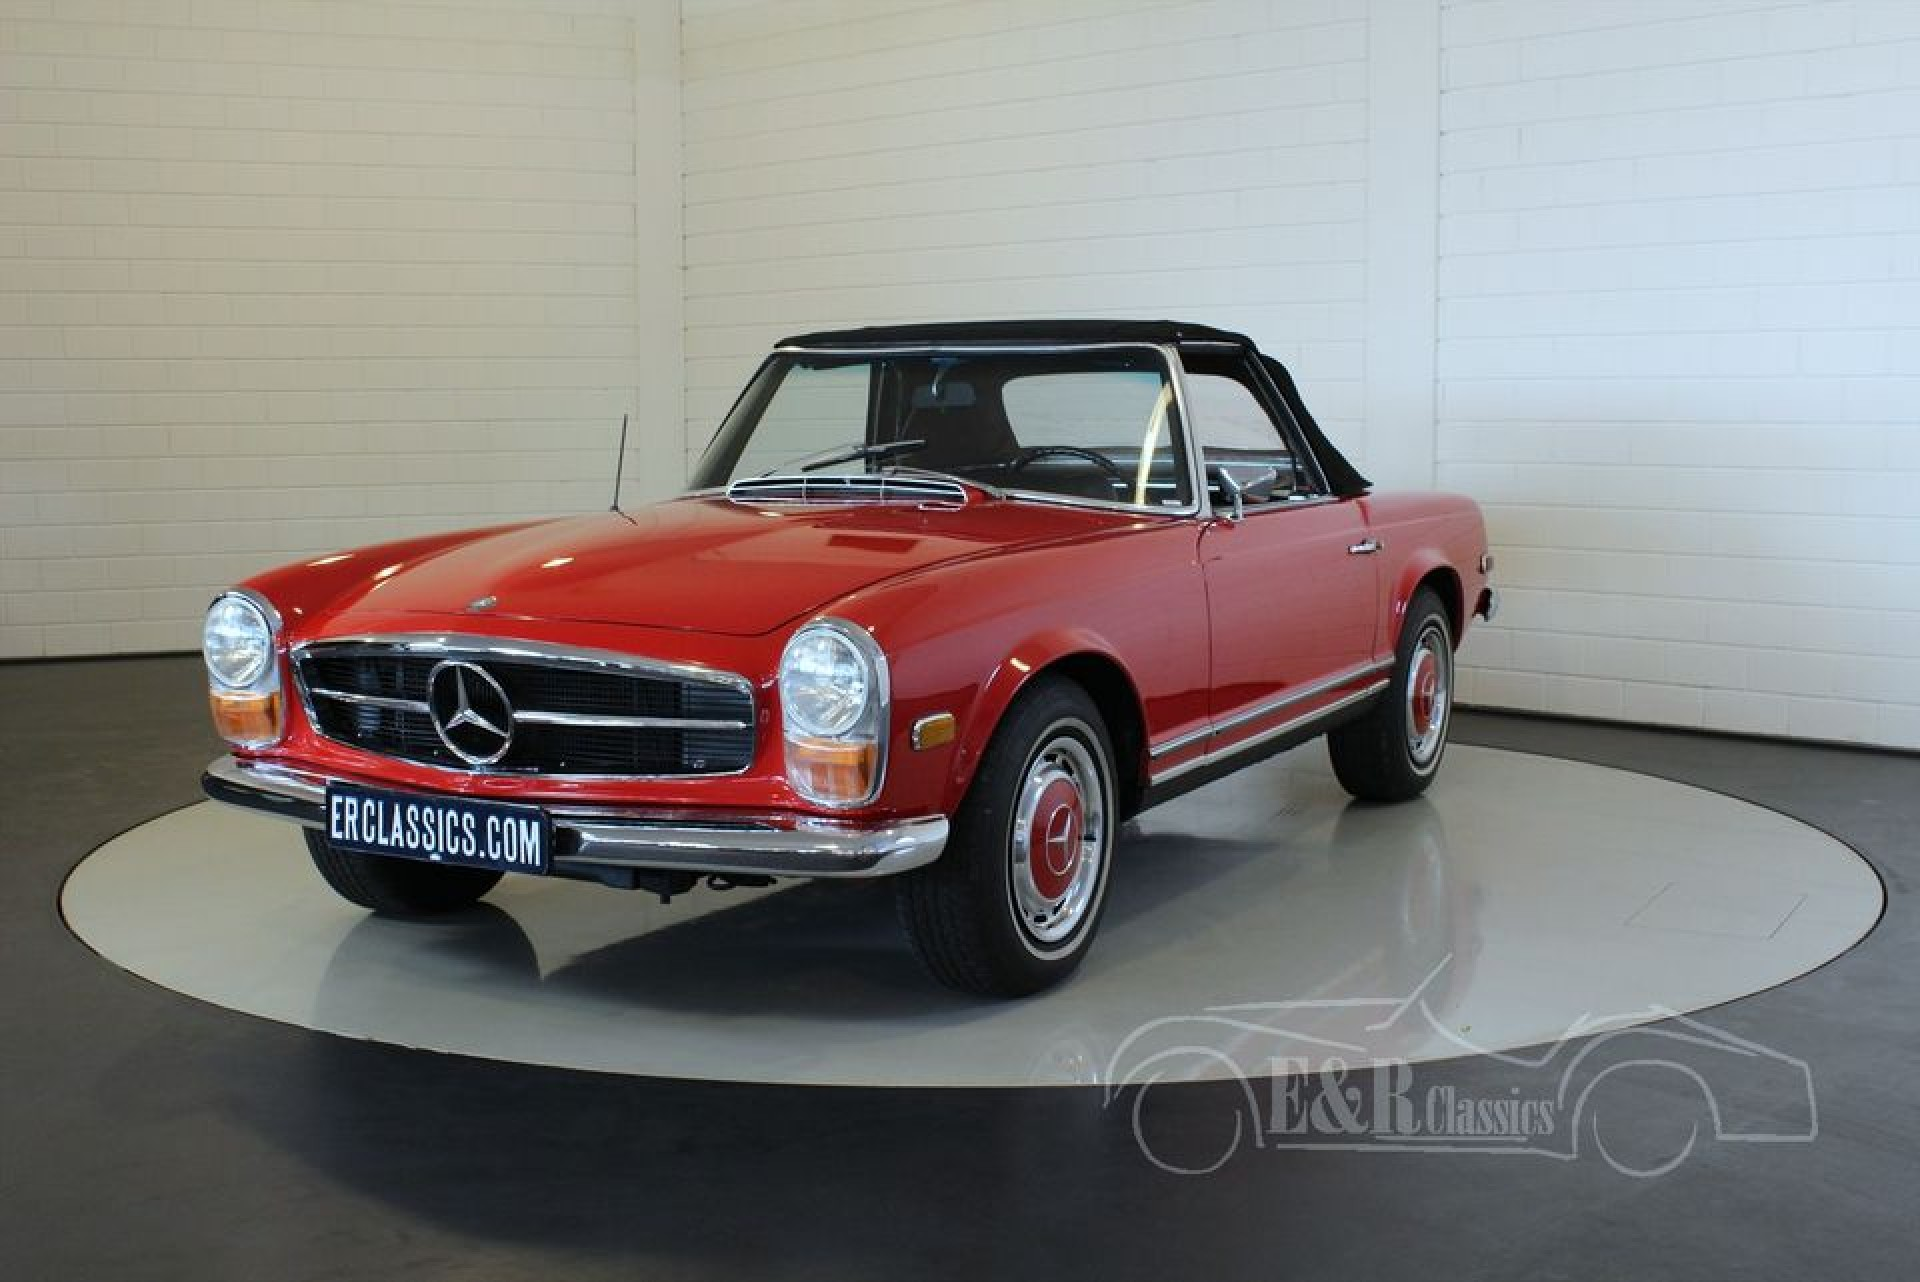 Mercedes benz 280sl pagode 1968 for sale at erclassics for Mercedes benz 1968 for sale